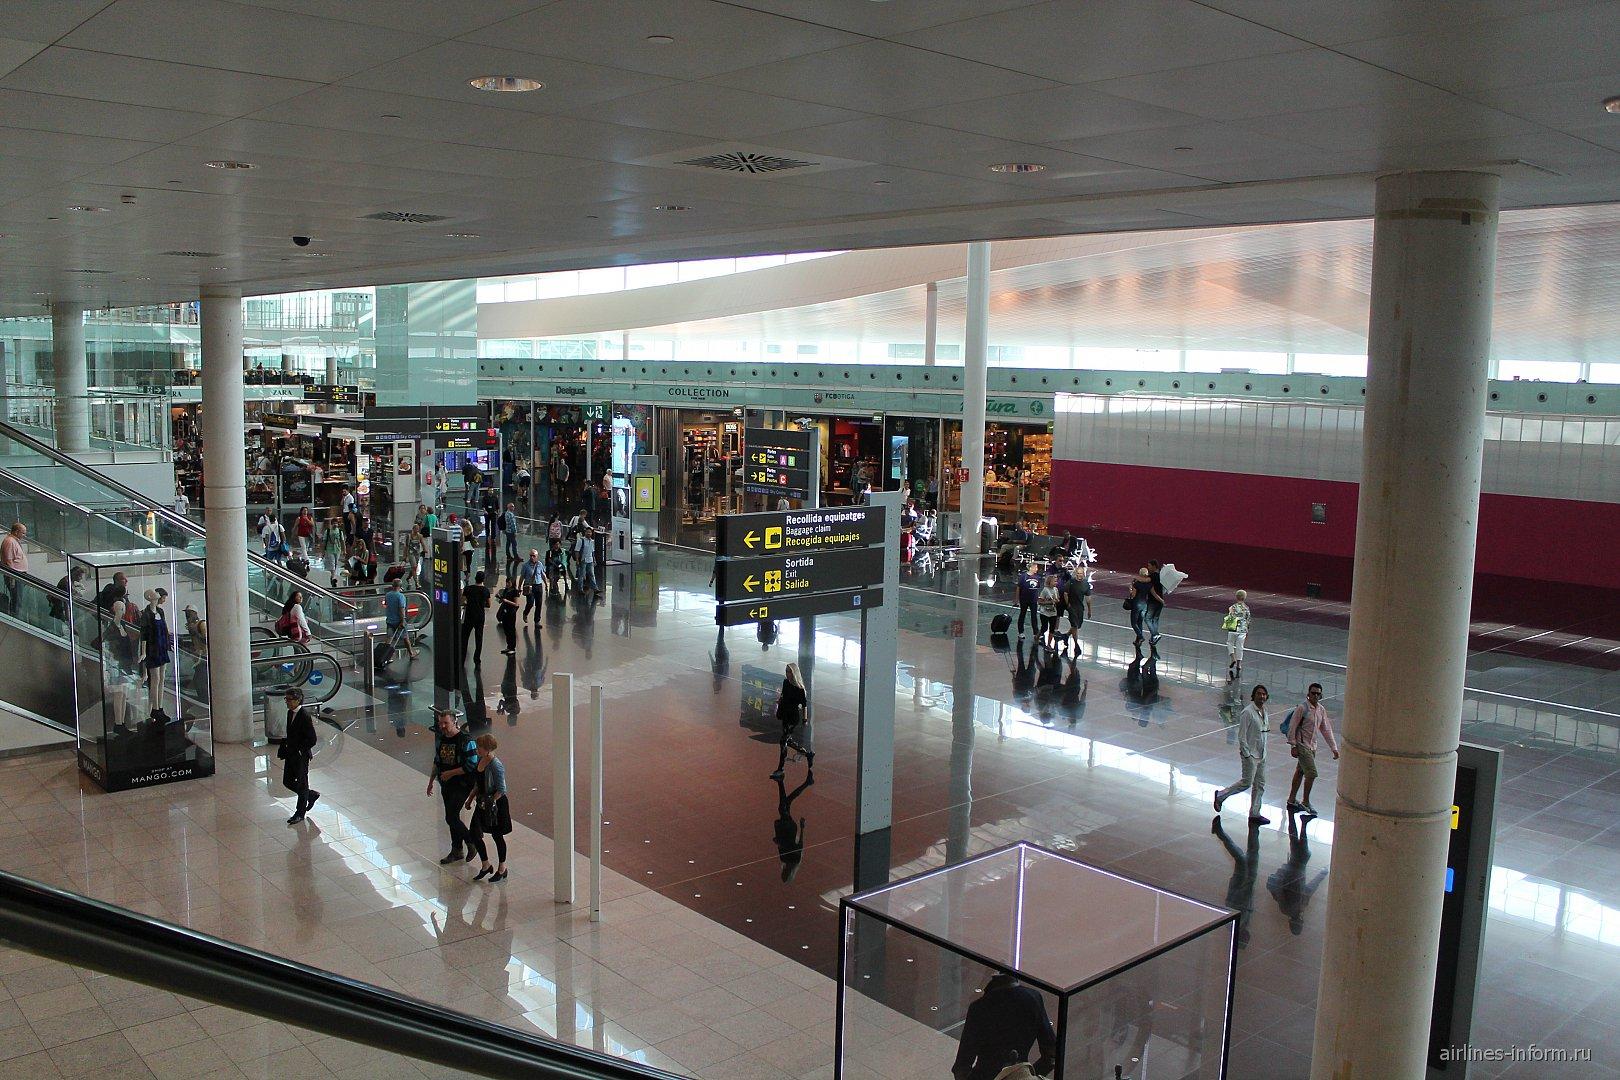 Чистая зона нового терминала Т1 аэропорта Барселоны